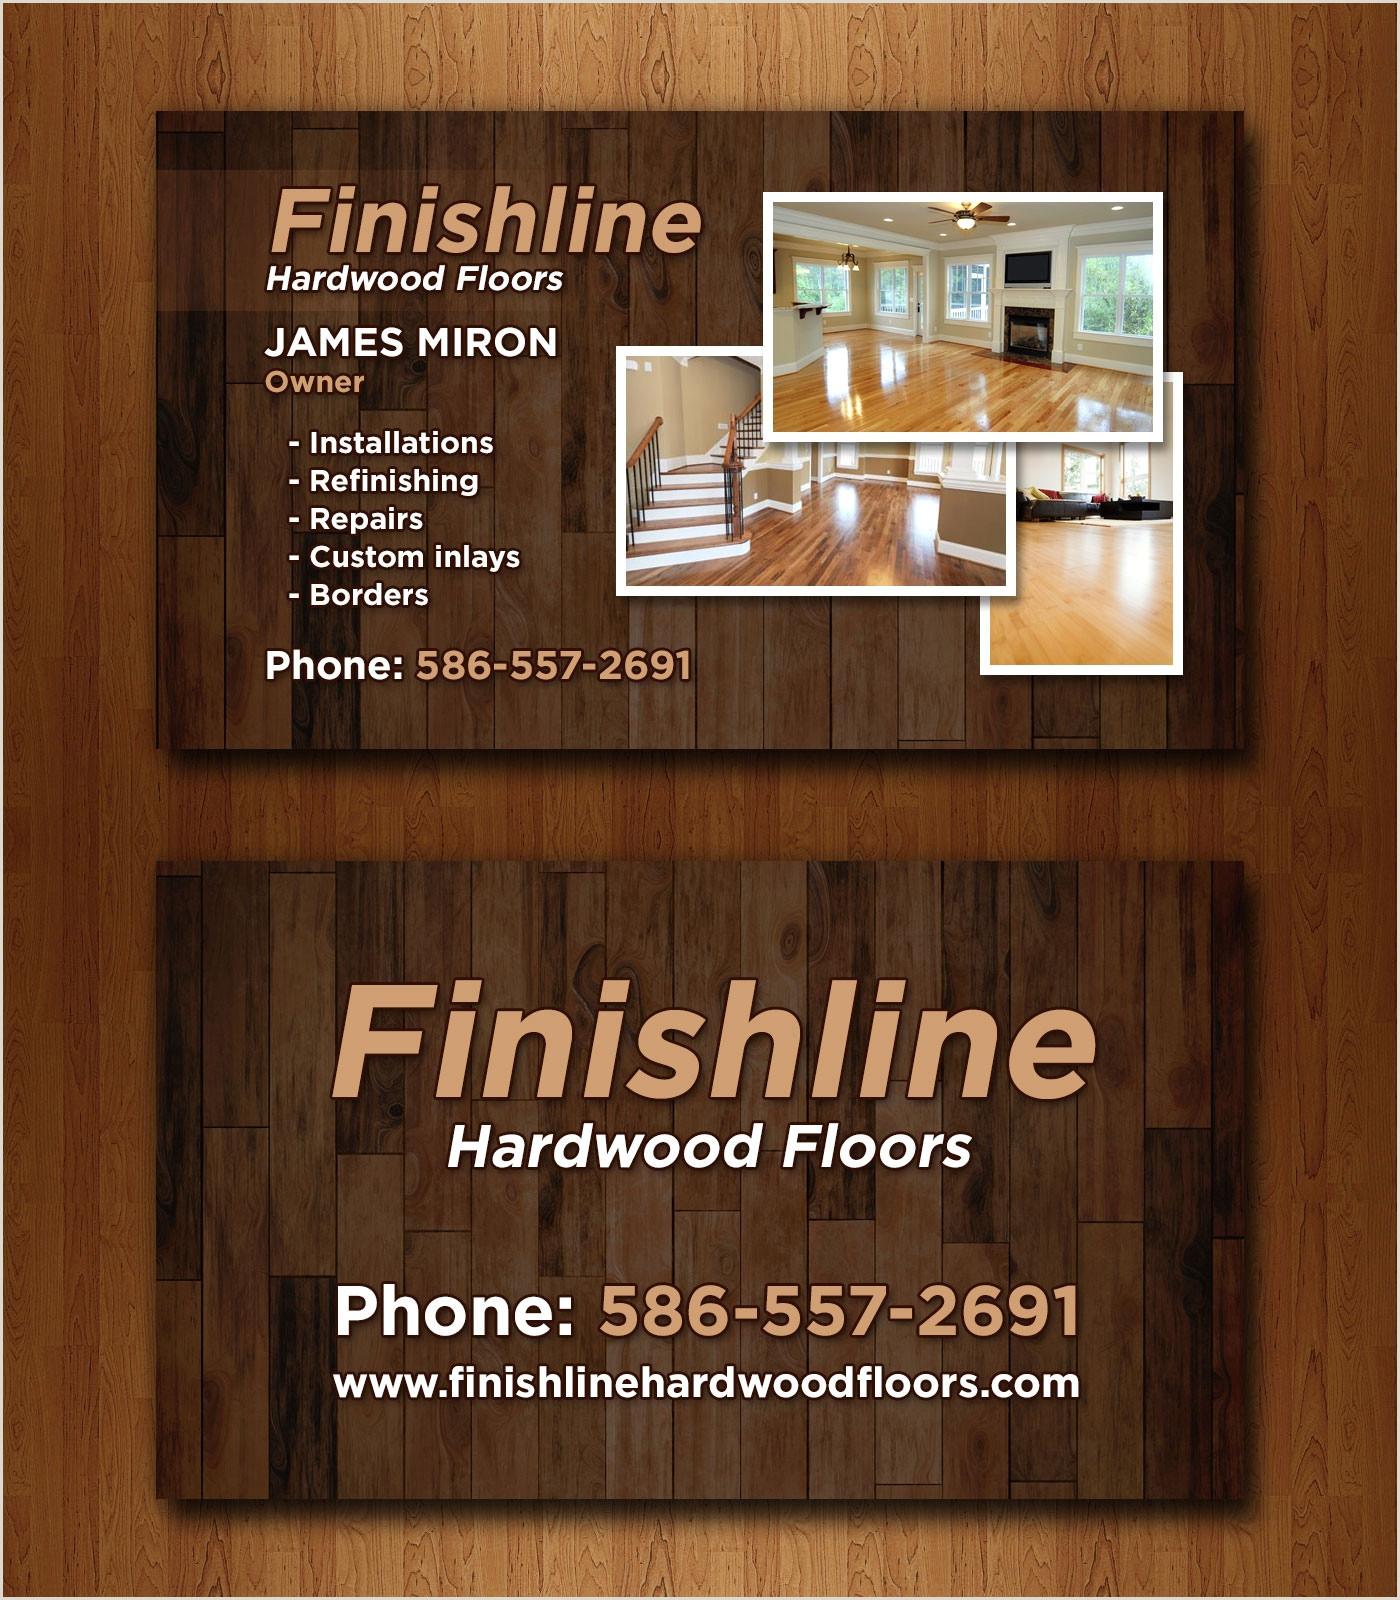 Business Card Design Pinterest 14 Popular Hardwood Flooring Business Card Template